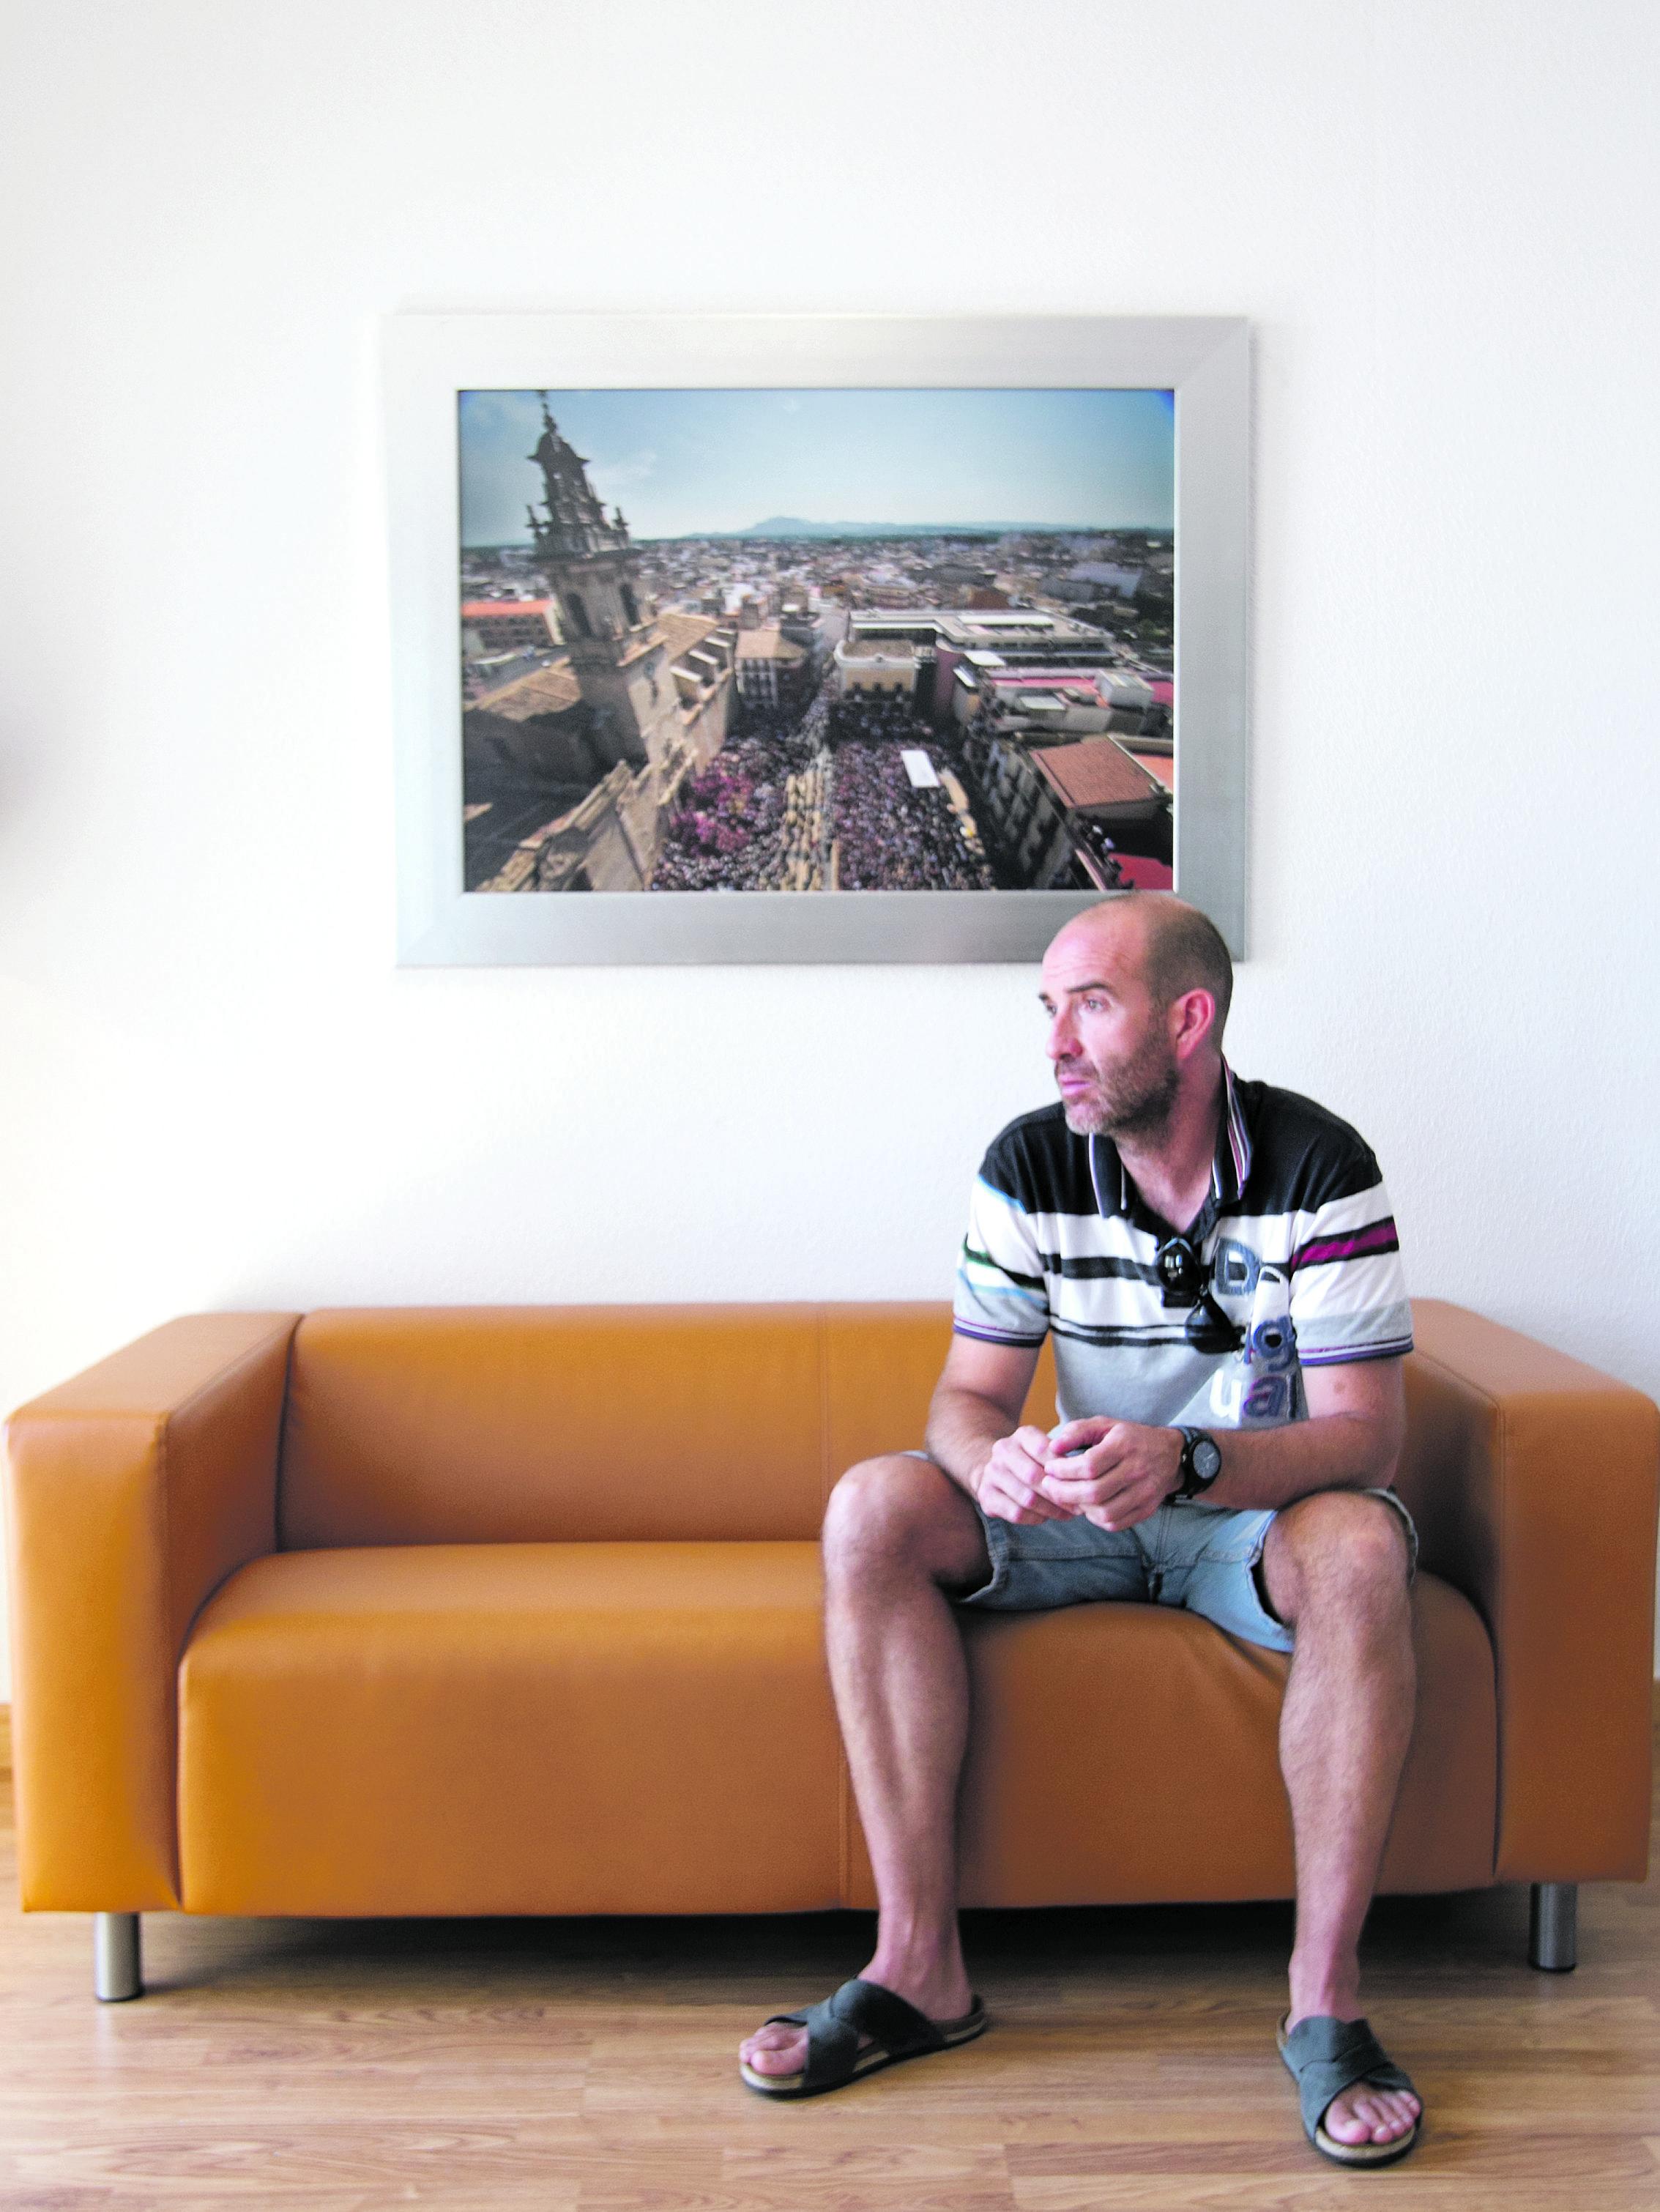 tornejants algemesi juanfran felici moises castell agencia prensa2 fotoperiodismo